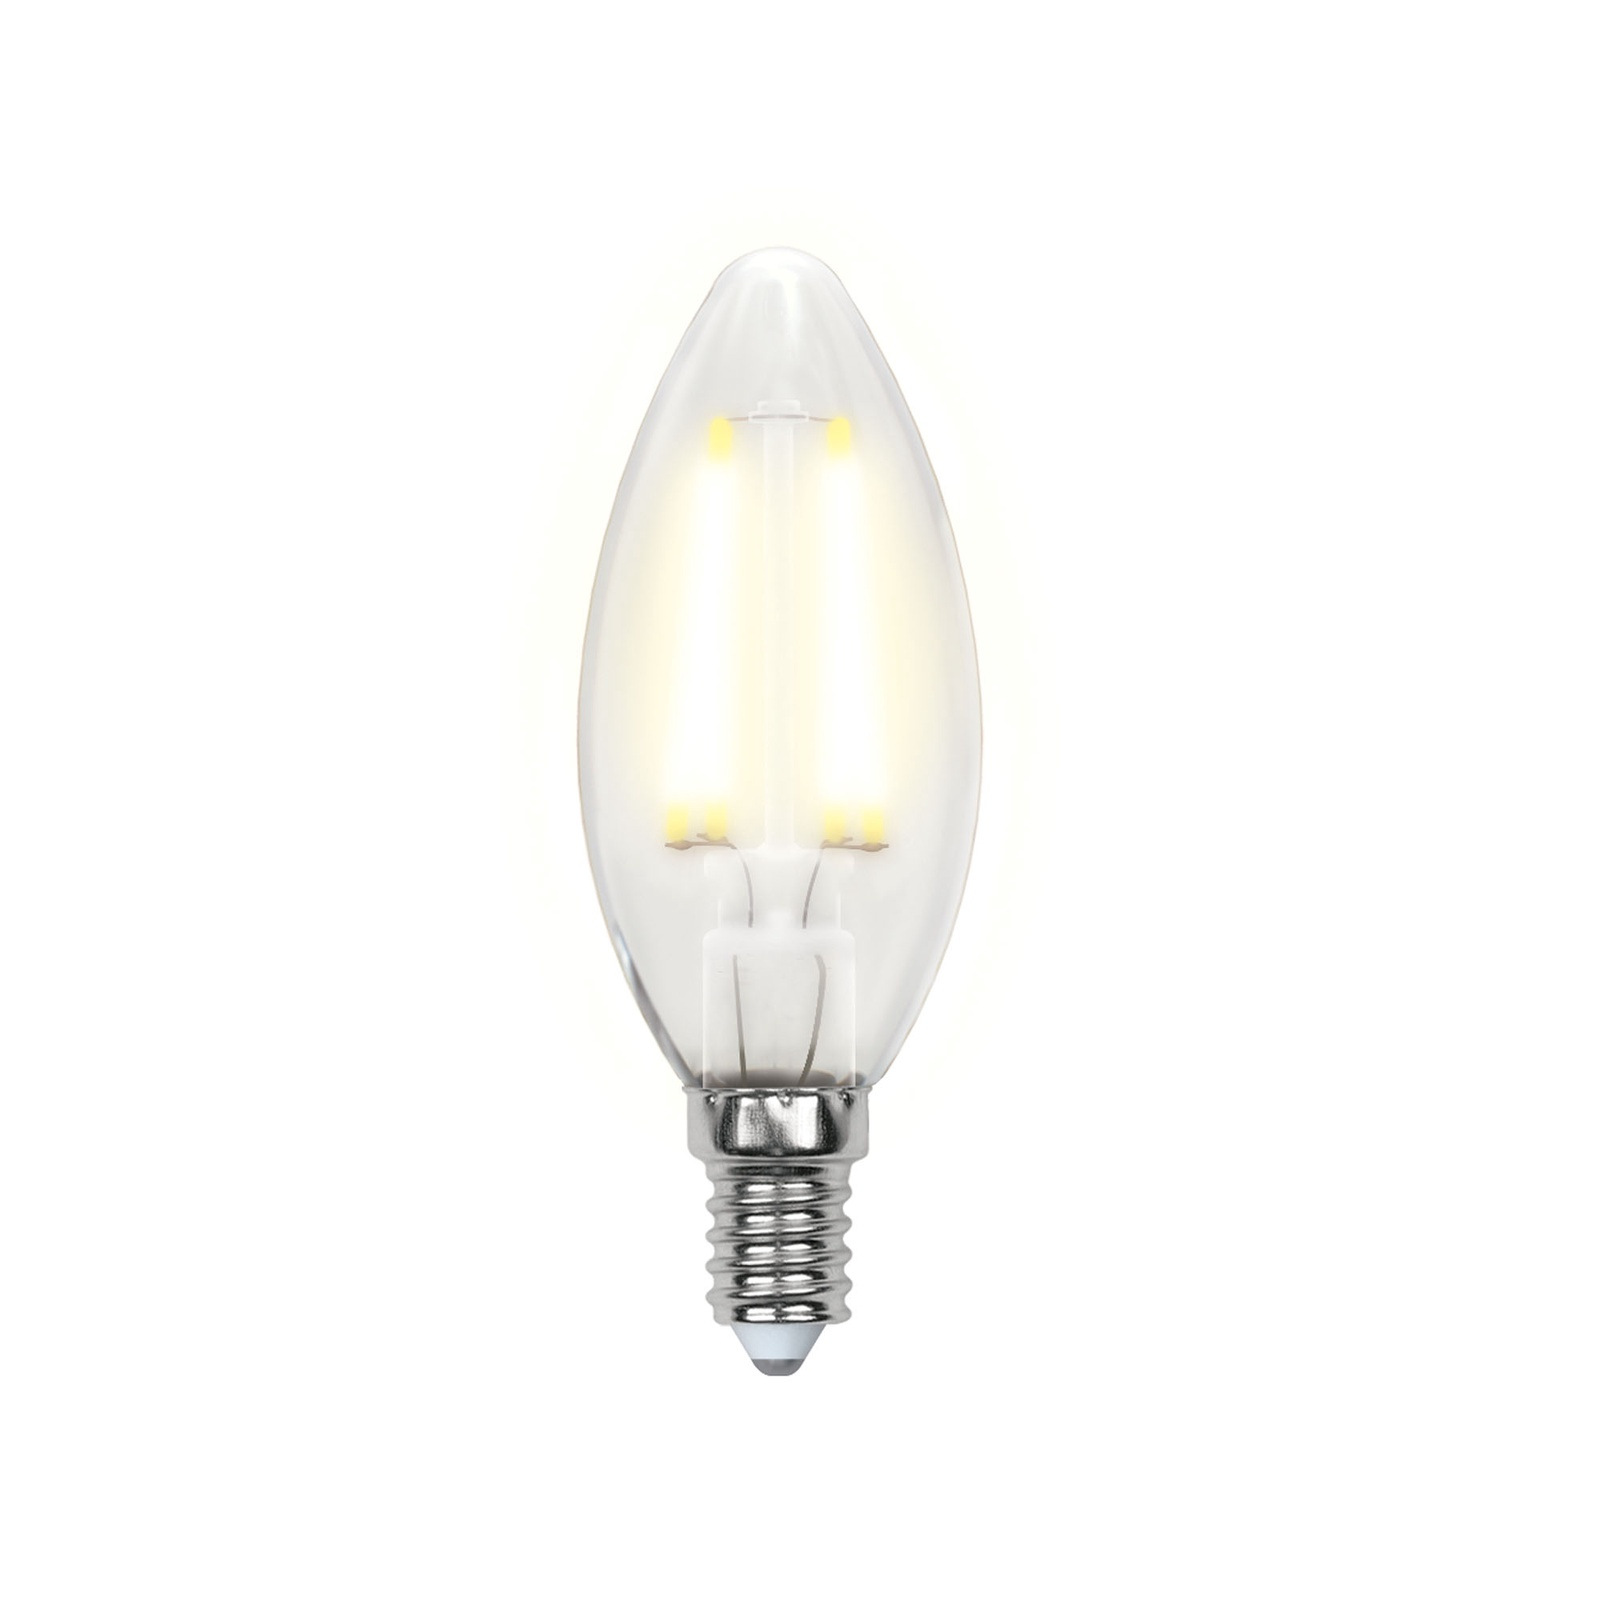 Лампочка Uniel LED-C35-6W/WW/E14/FR 3000K, Теплый свет 6 Вт, Светодиодная